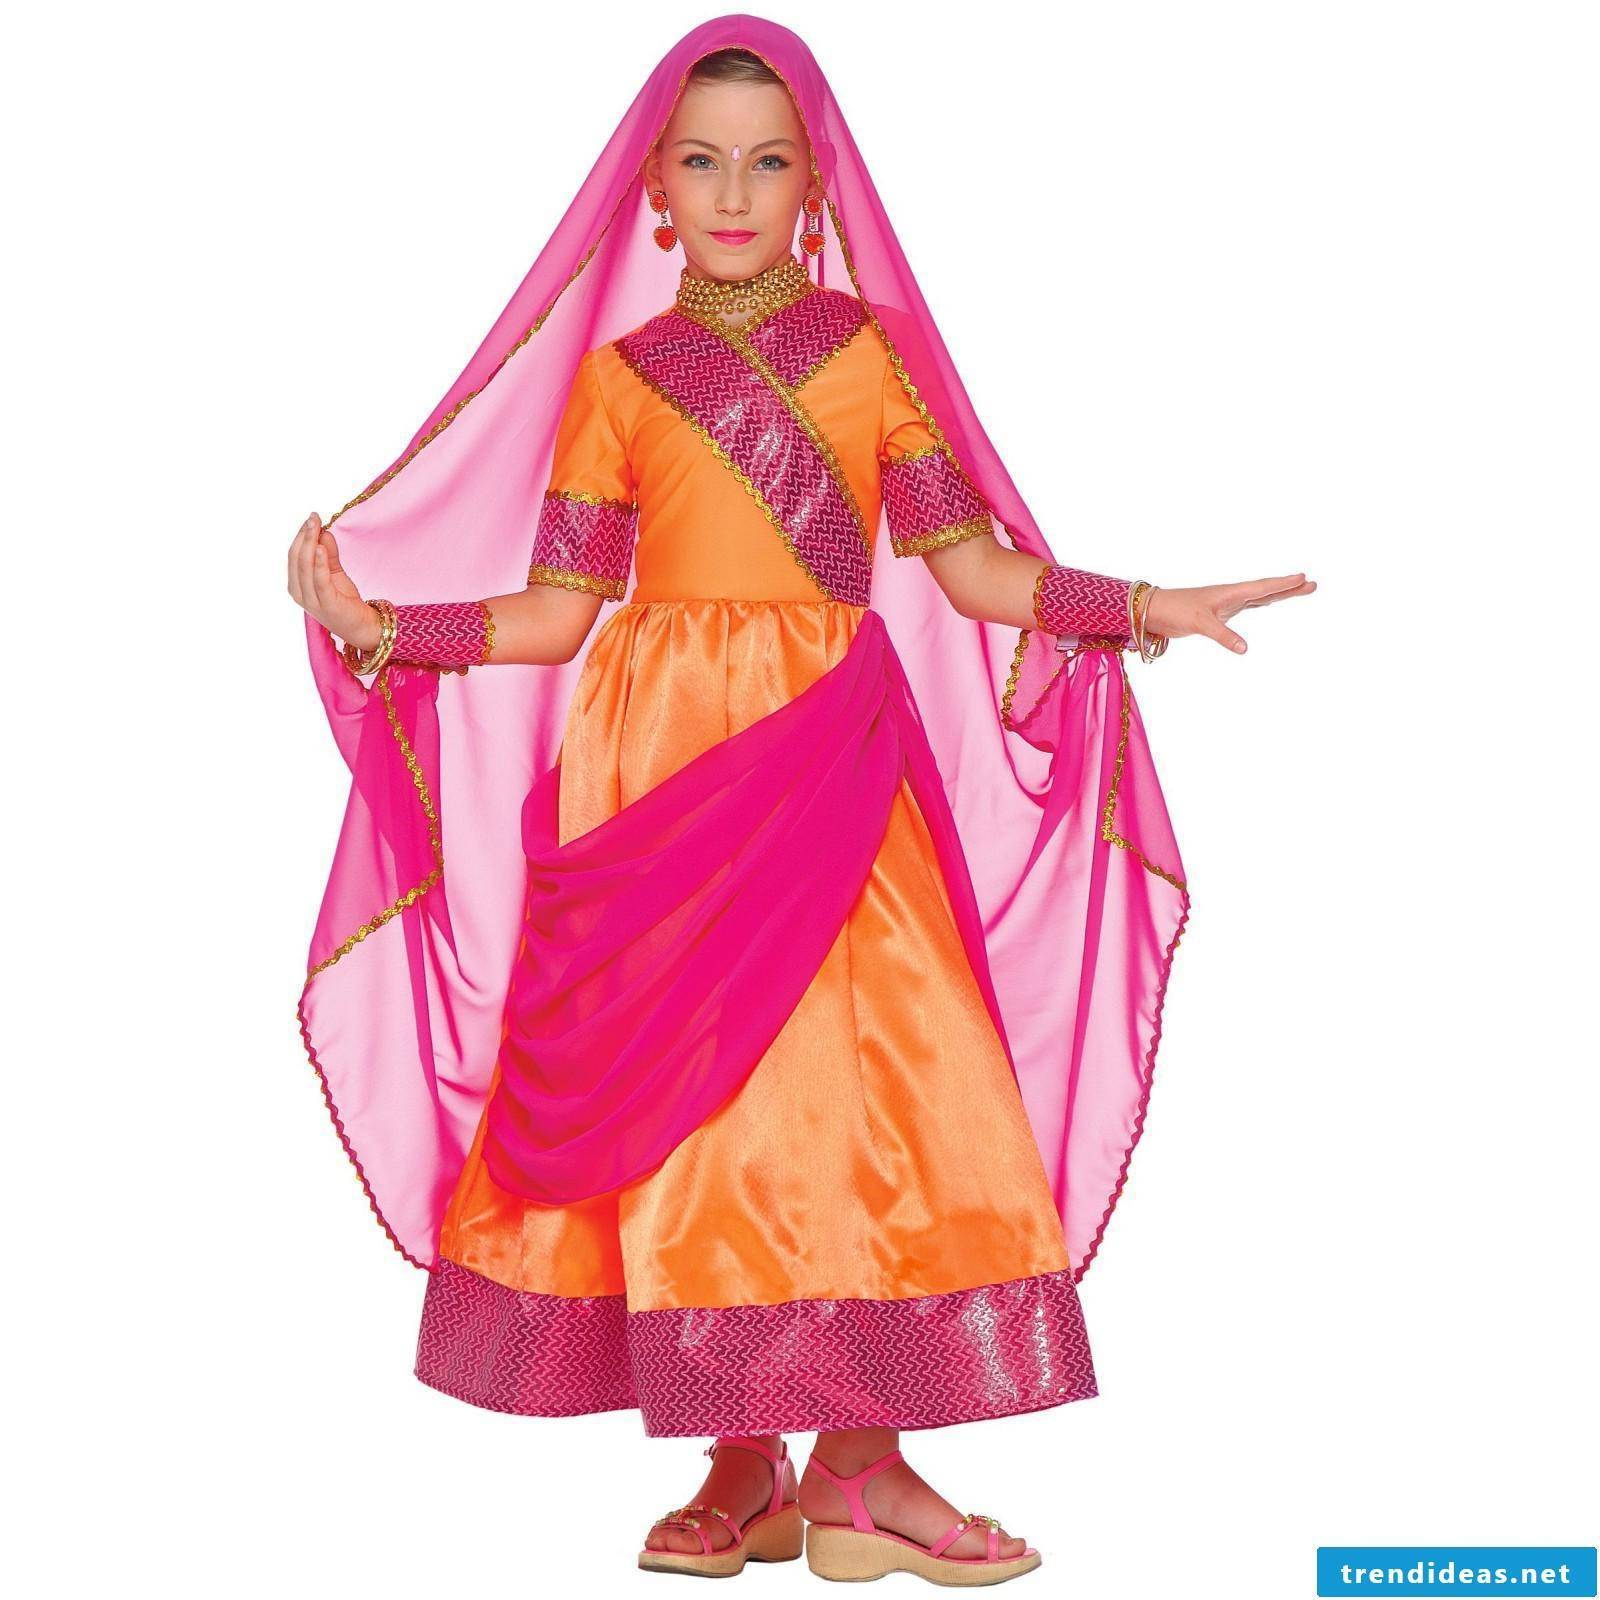 Little Indian princess